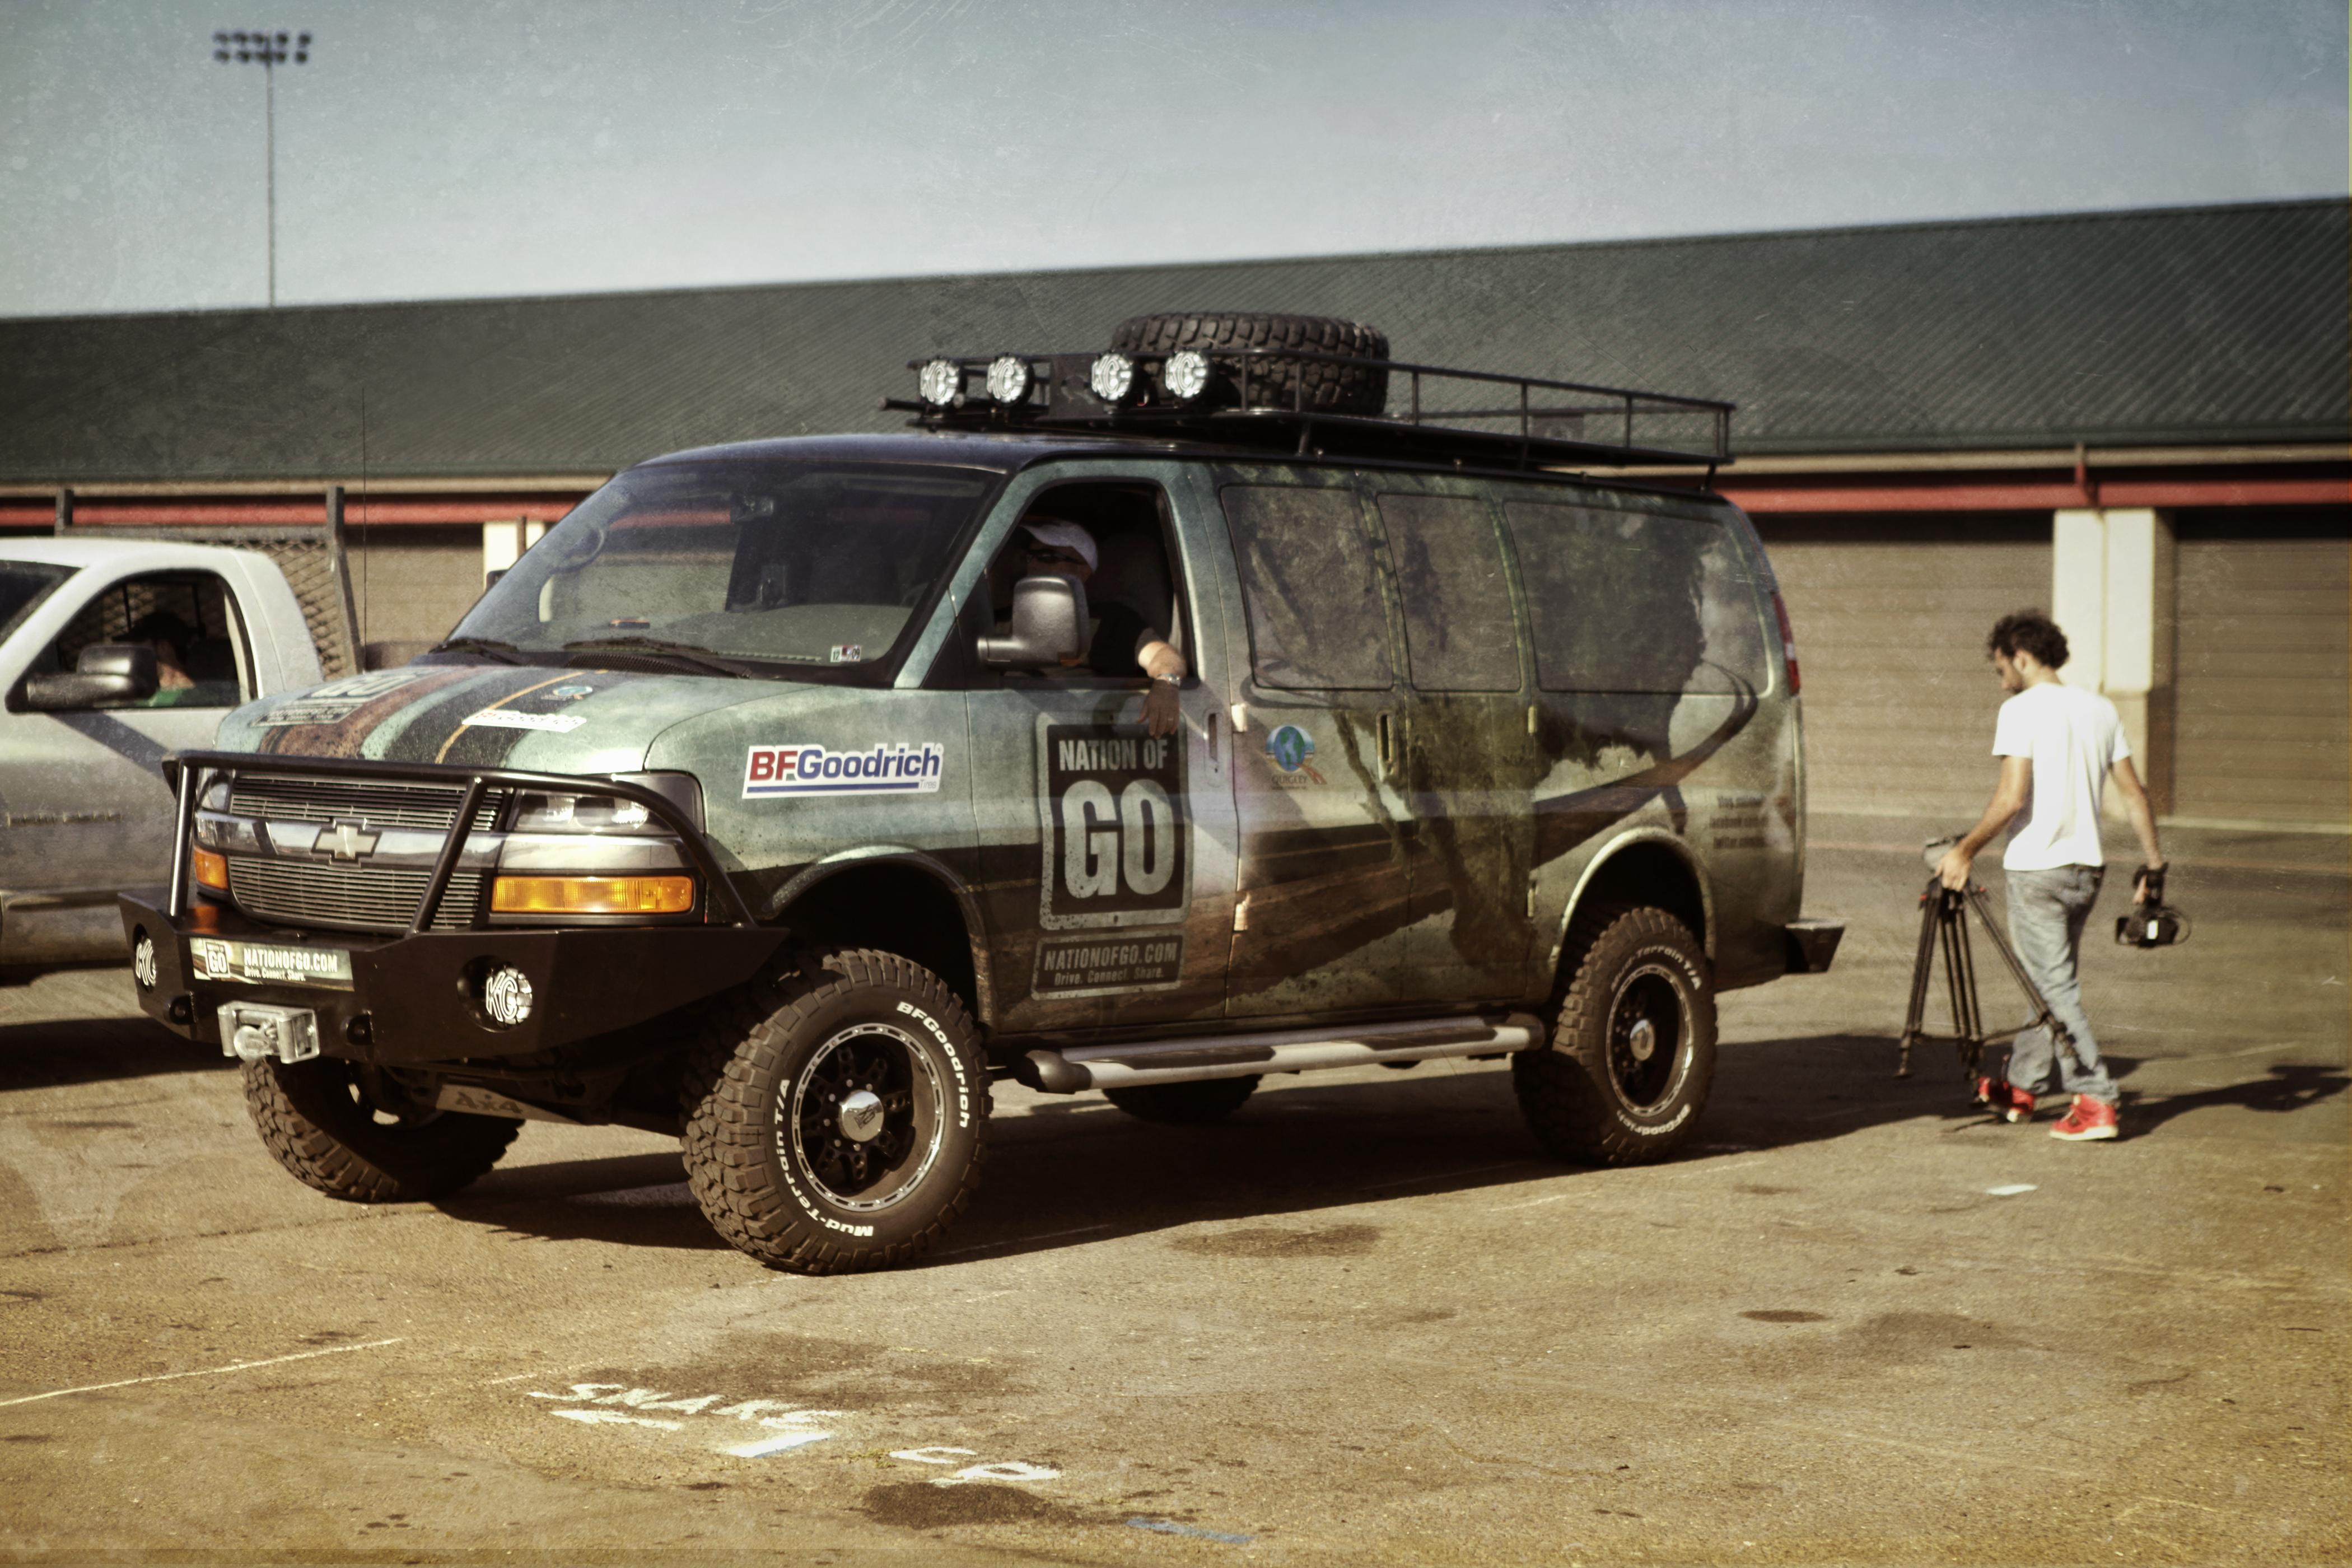 Craigslist 4x4 Vans For Sale